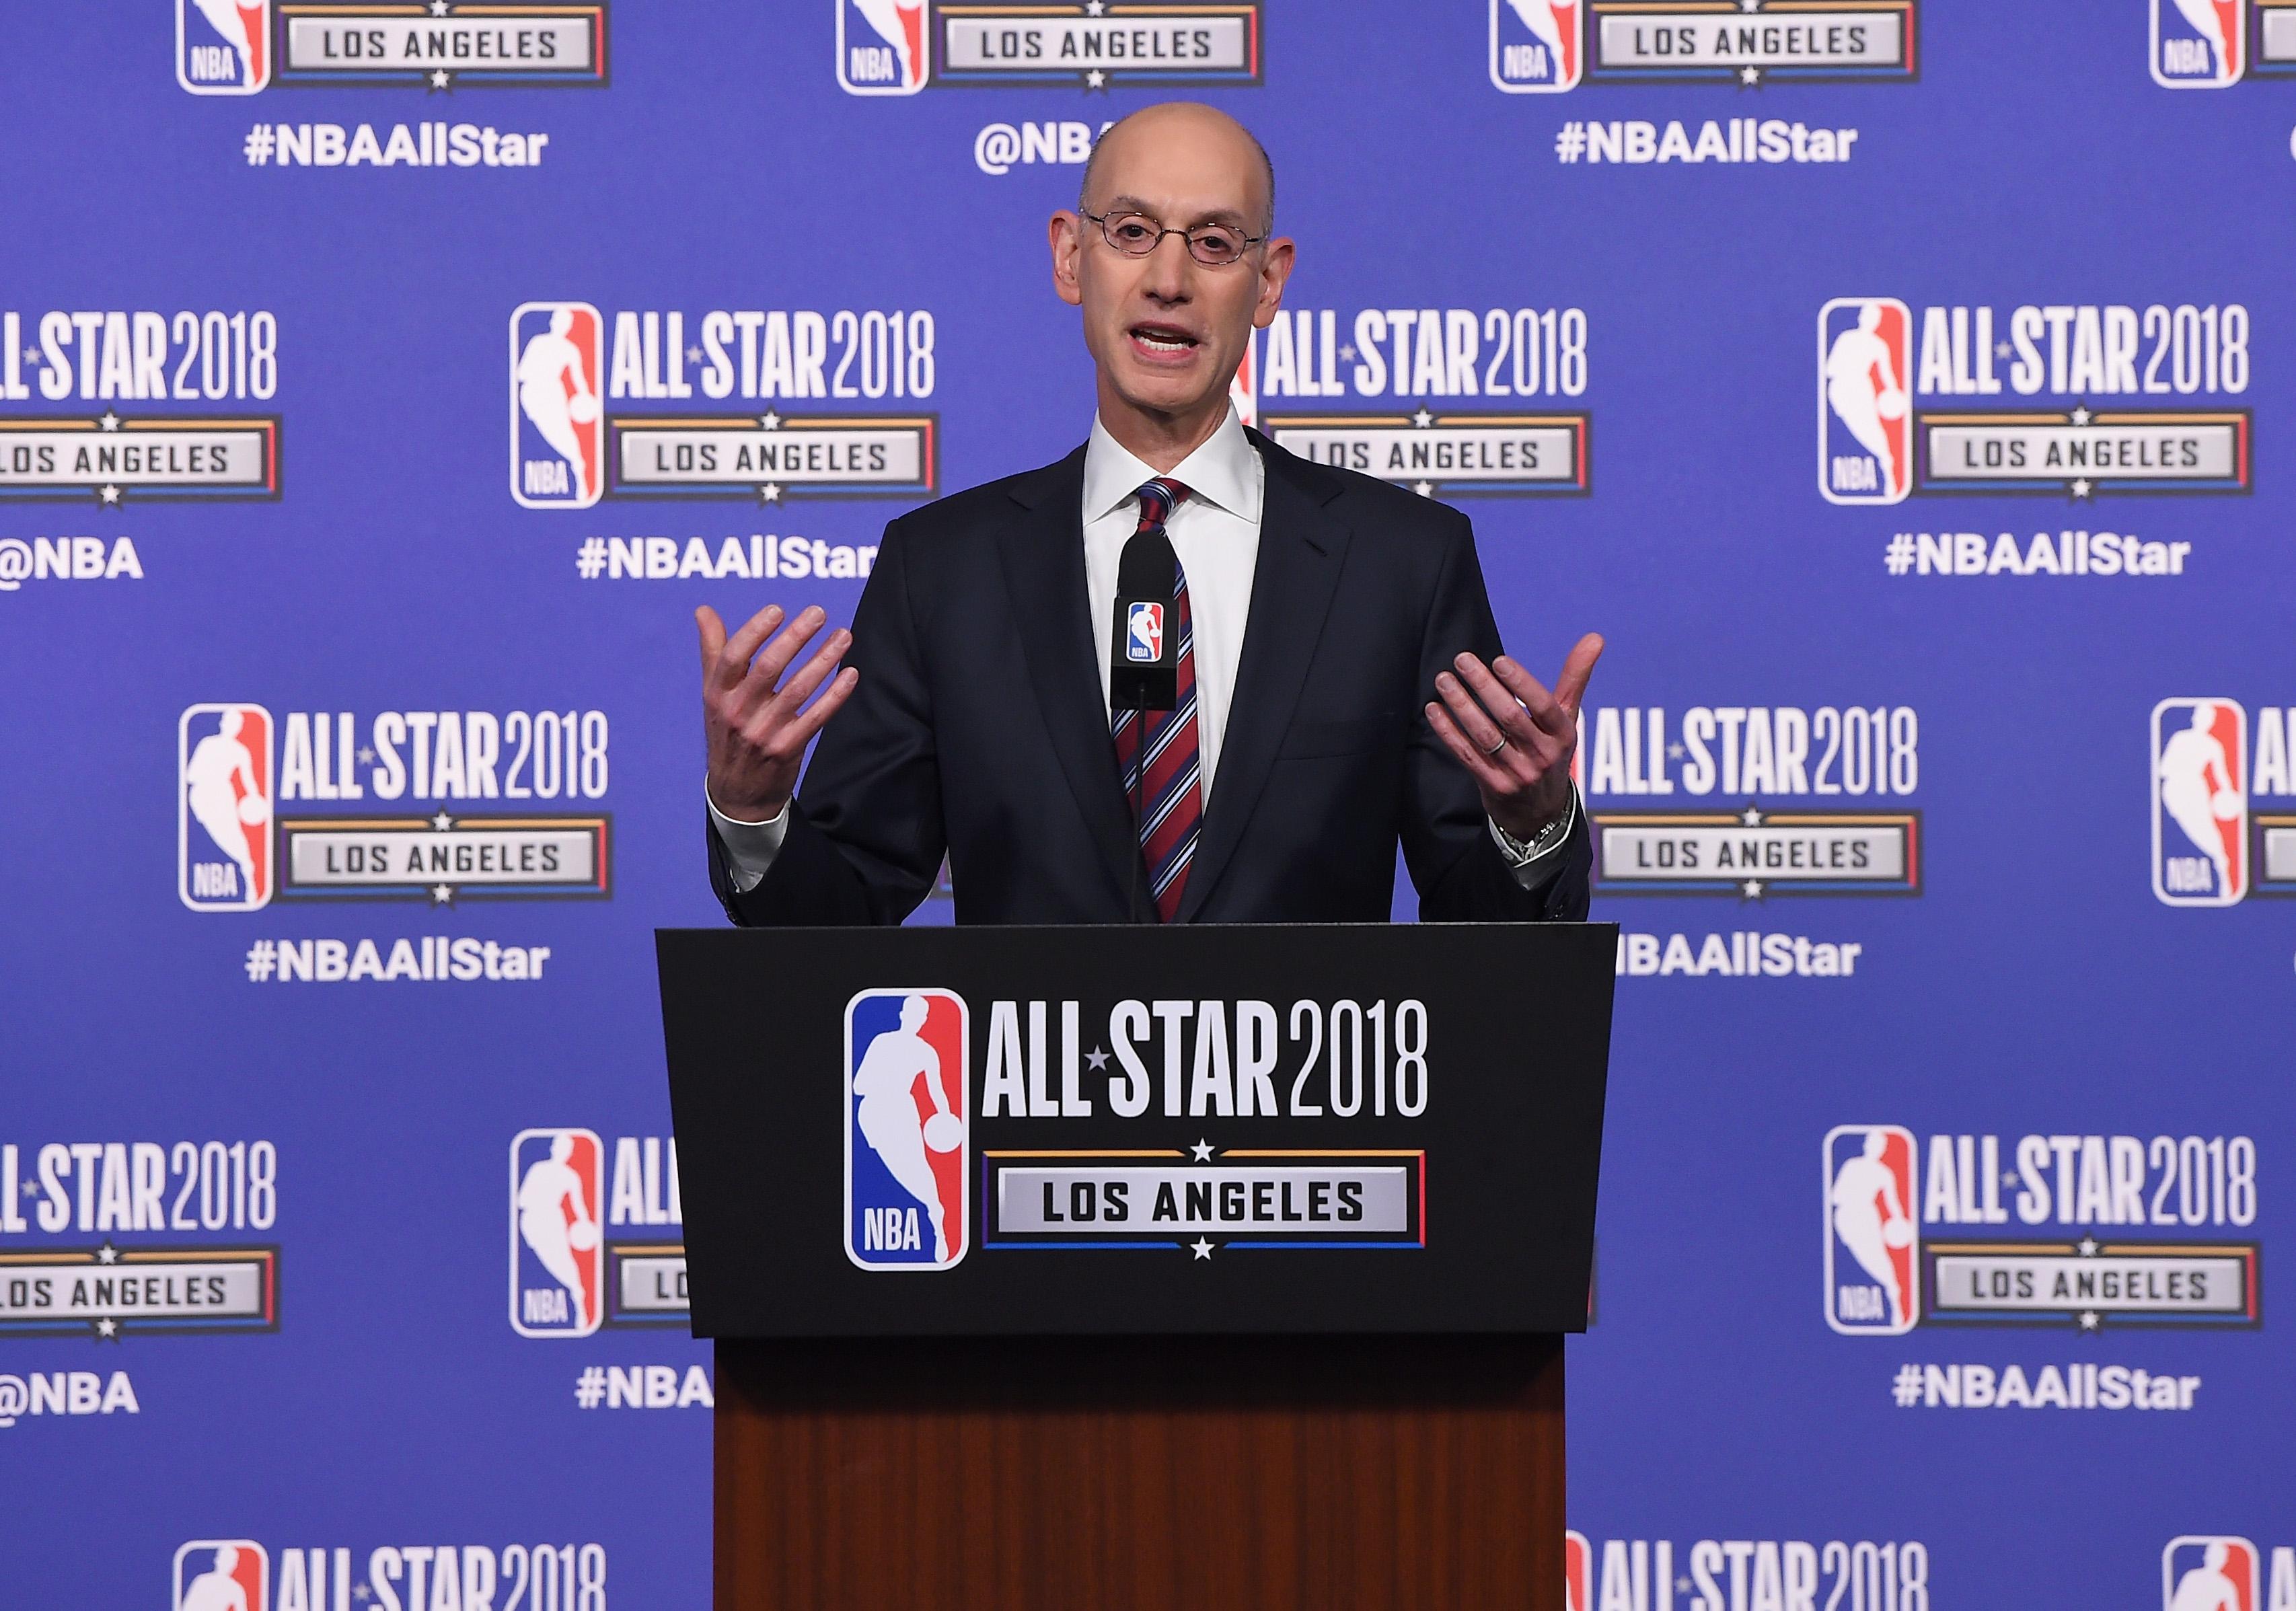 NBA All-Star Game 2018 - Commissioner Adam Silver Press Conference